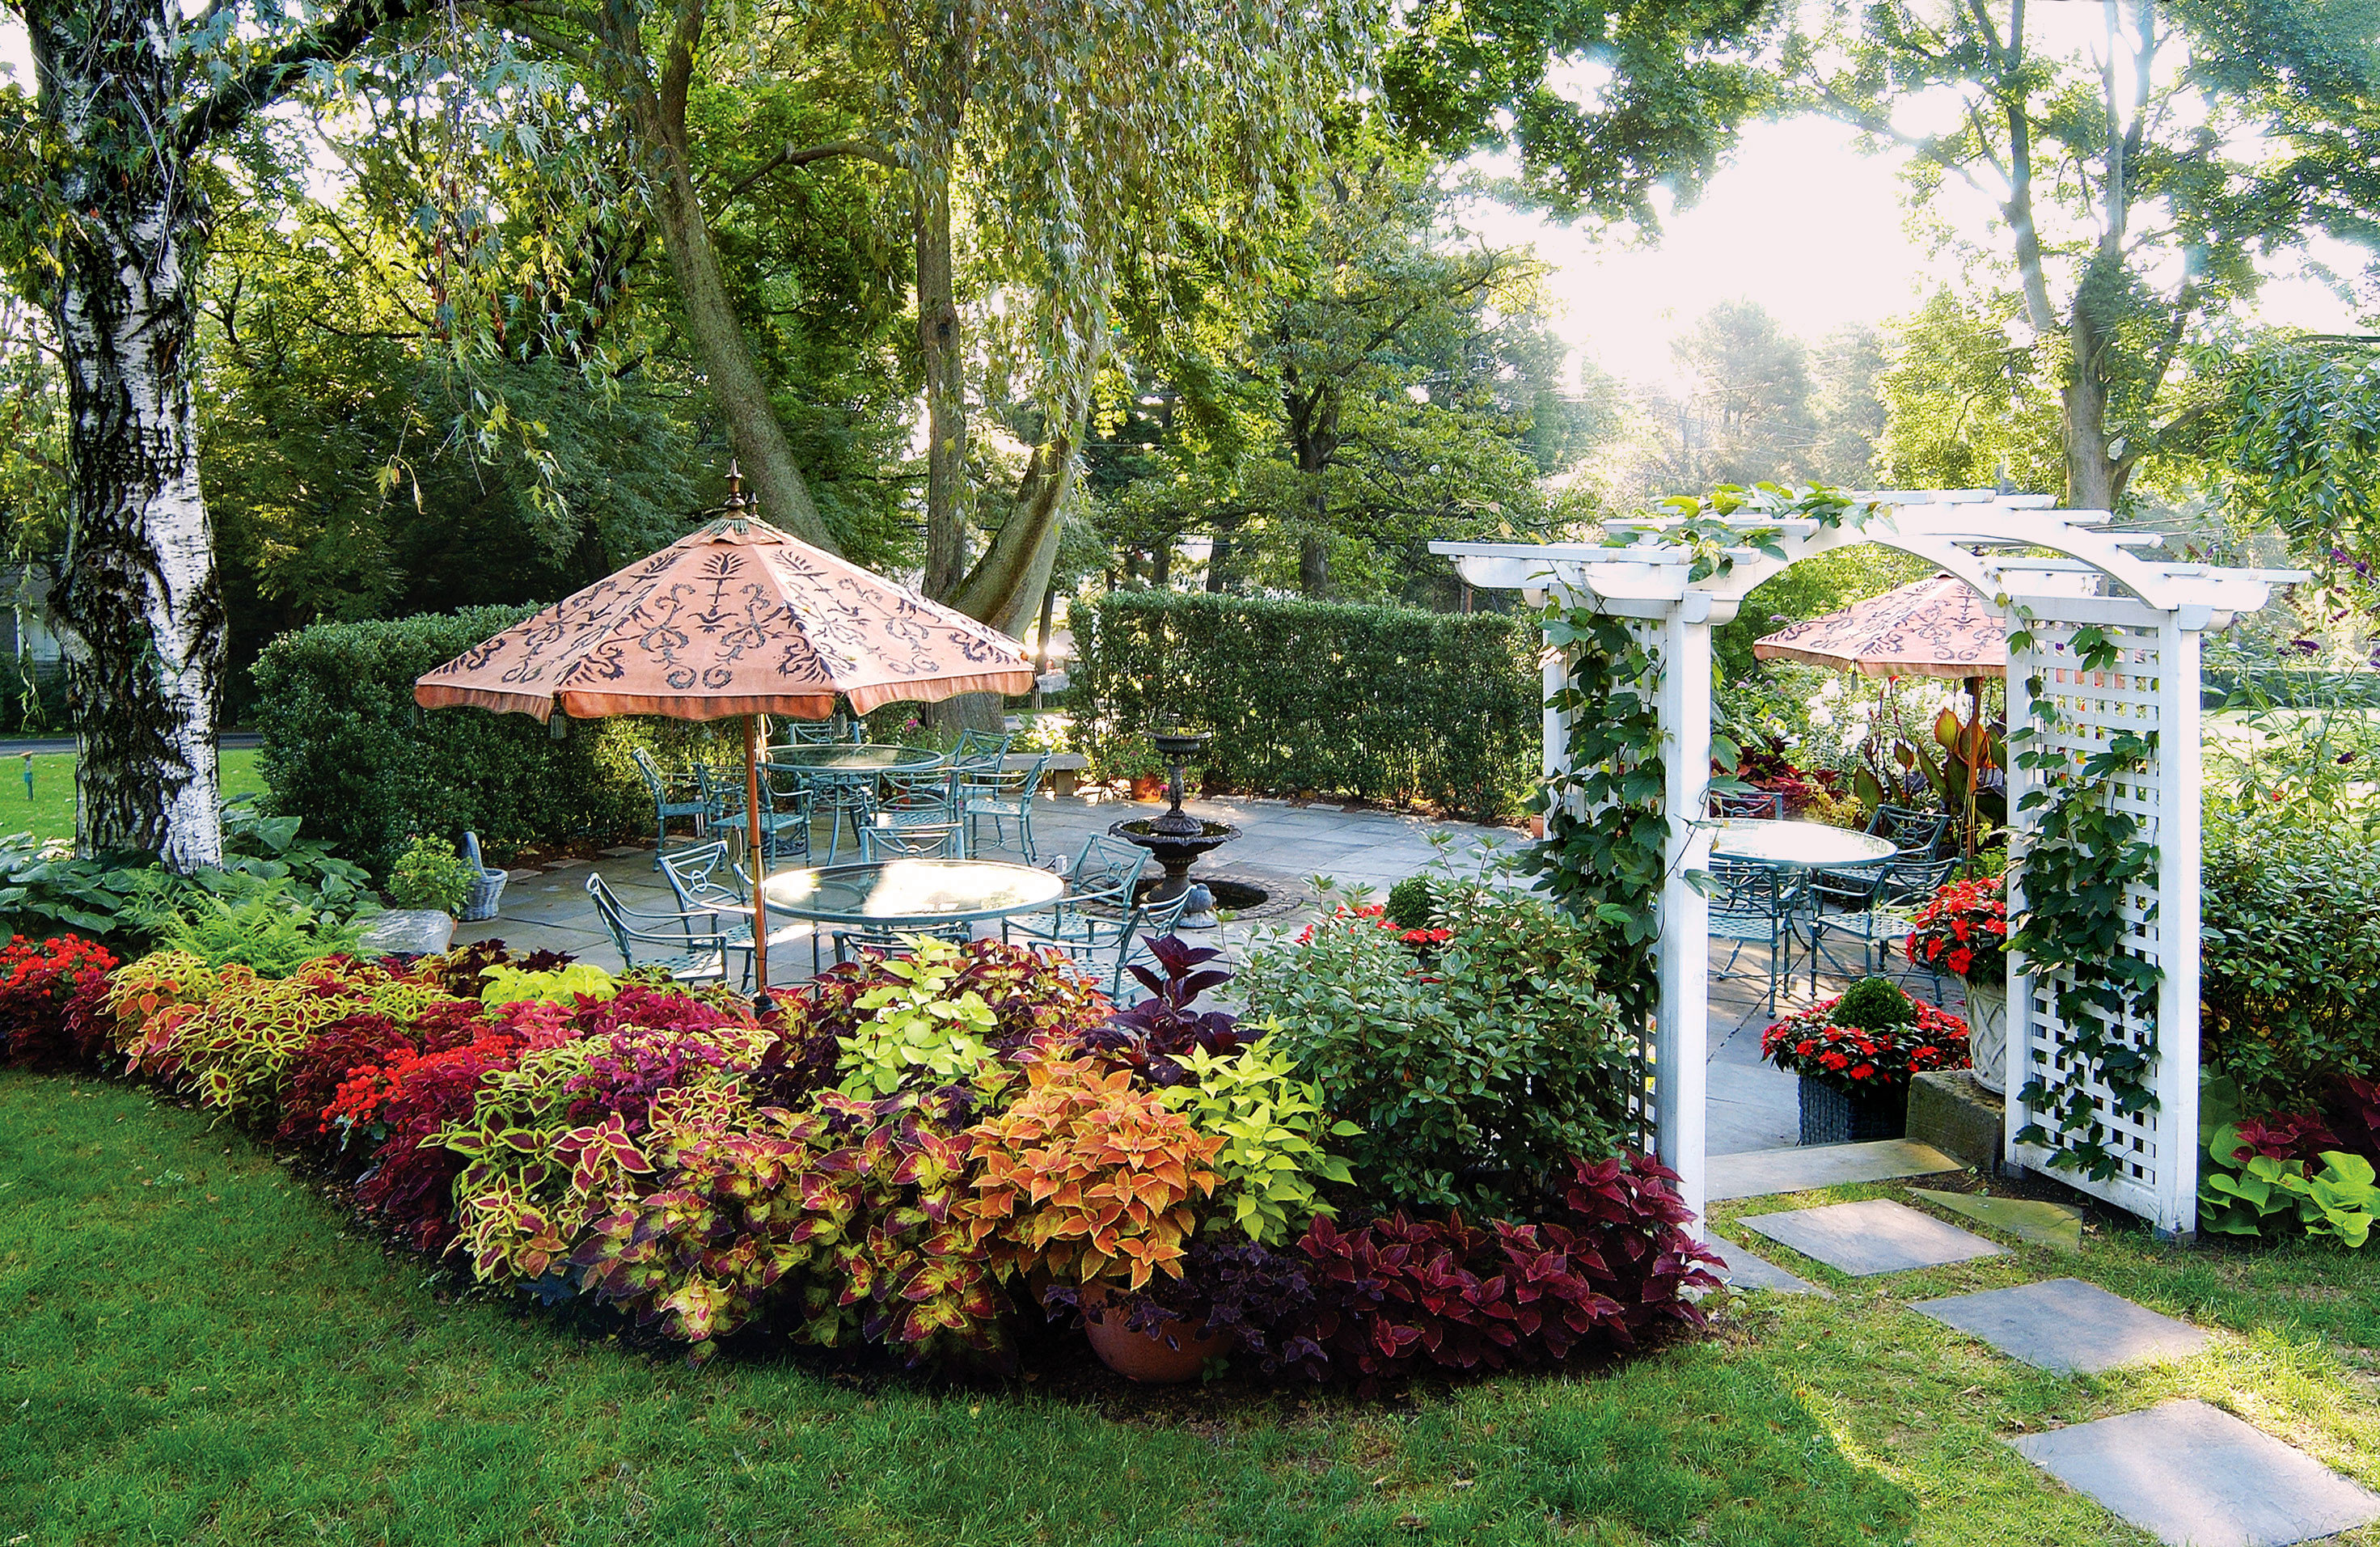 Country Elegant Grounds Inn tree grass flora Garden botany gazebo backyard flower floristry lawn outdoor structure yard botanical garden surrounded lush